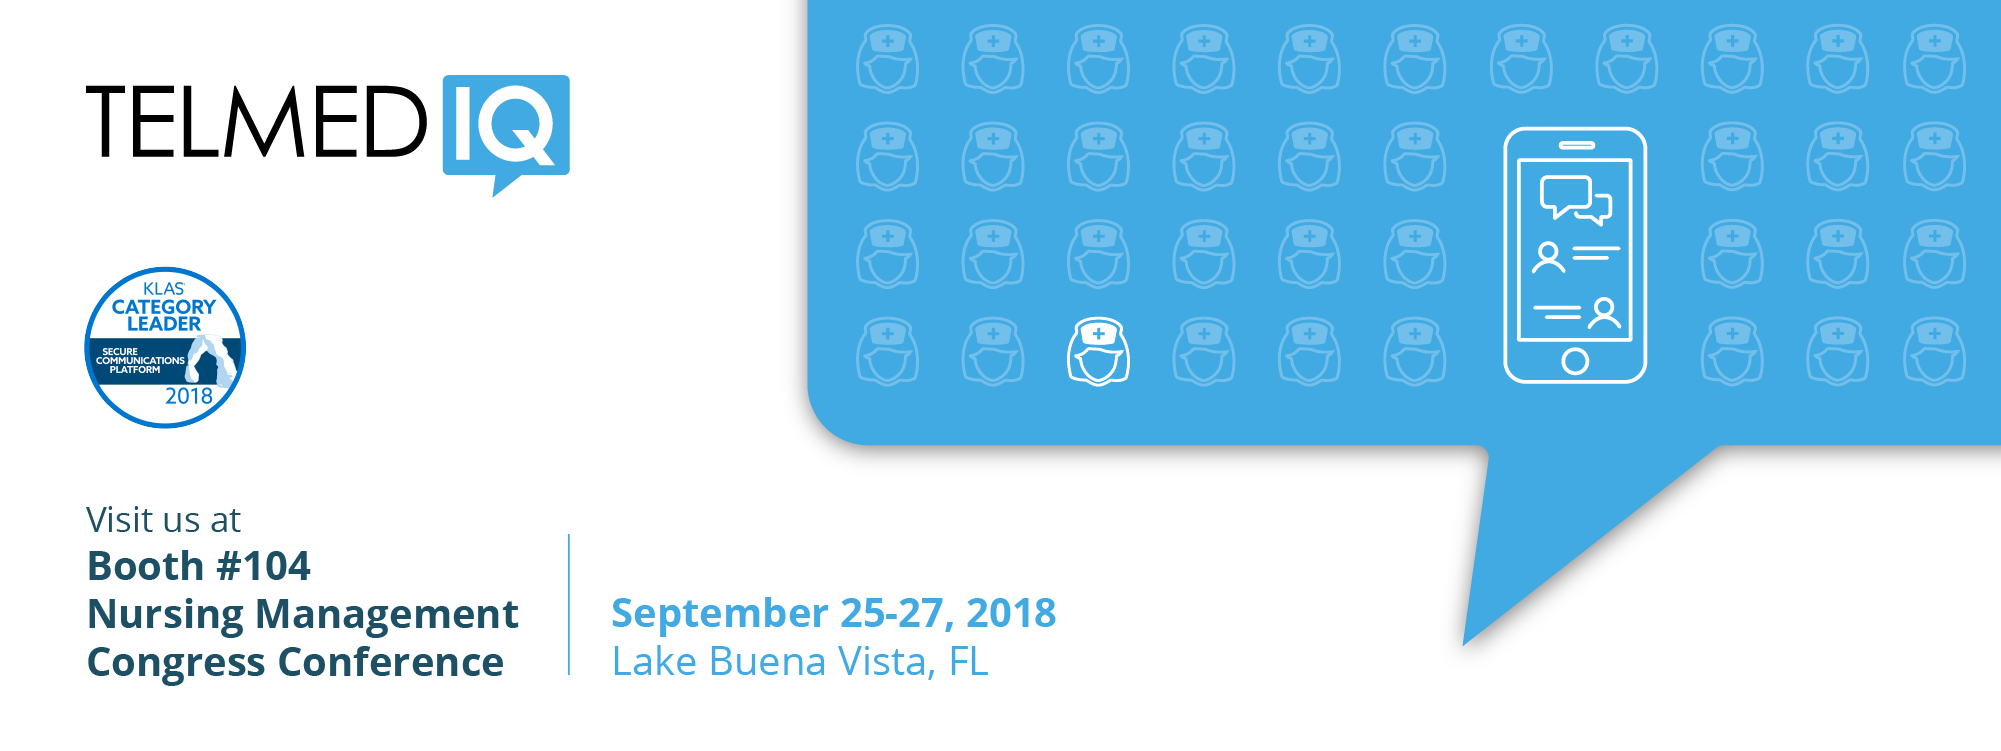 Nursing Management Congress Conference